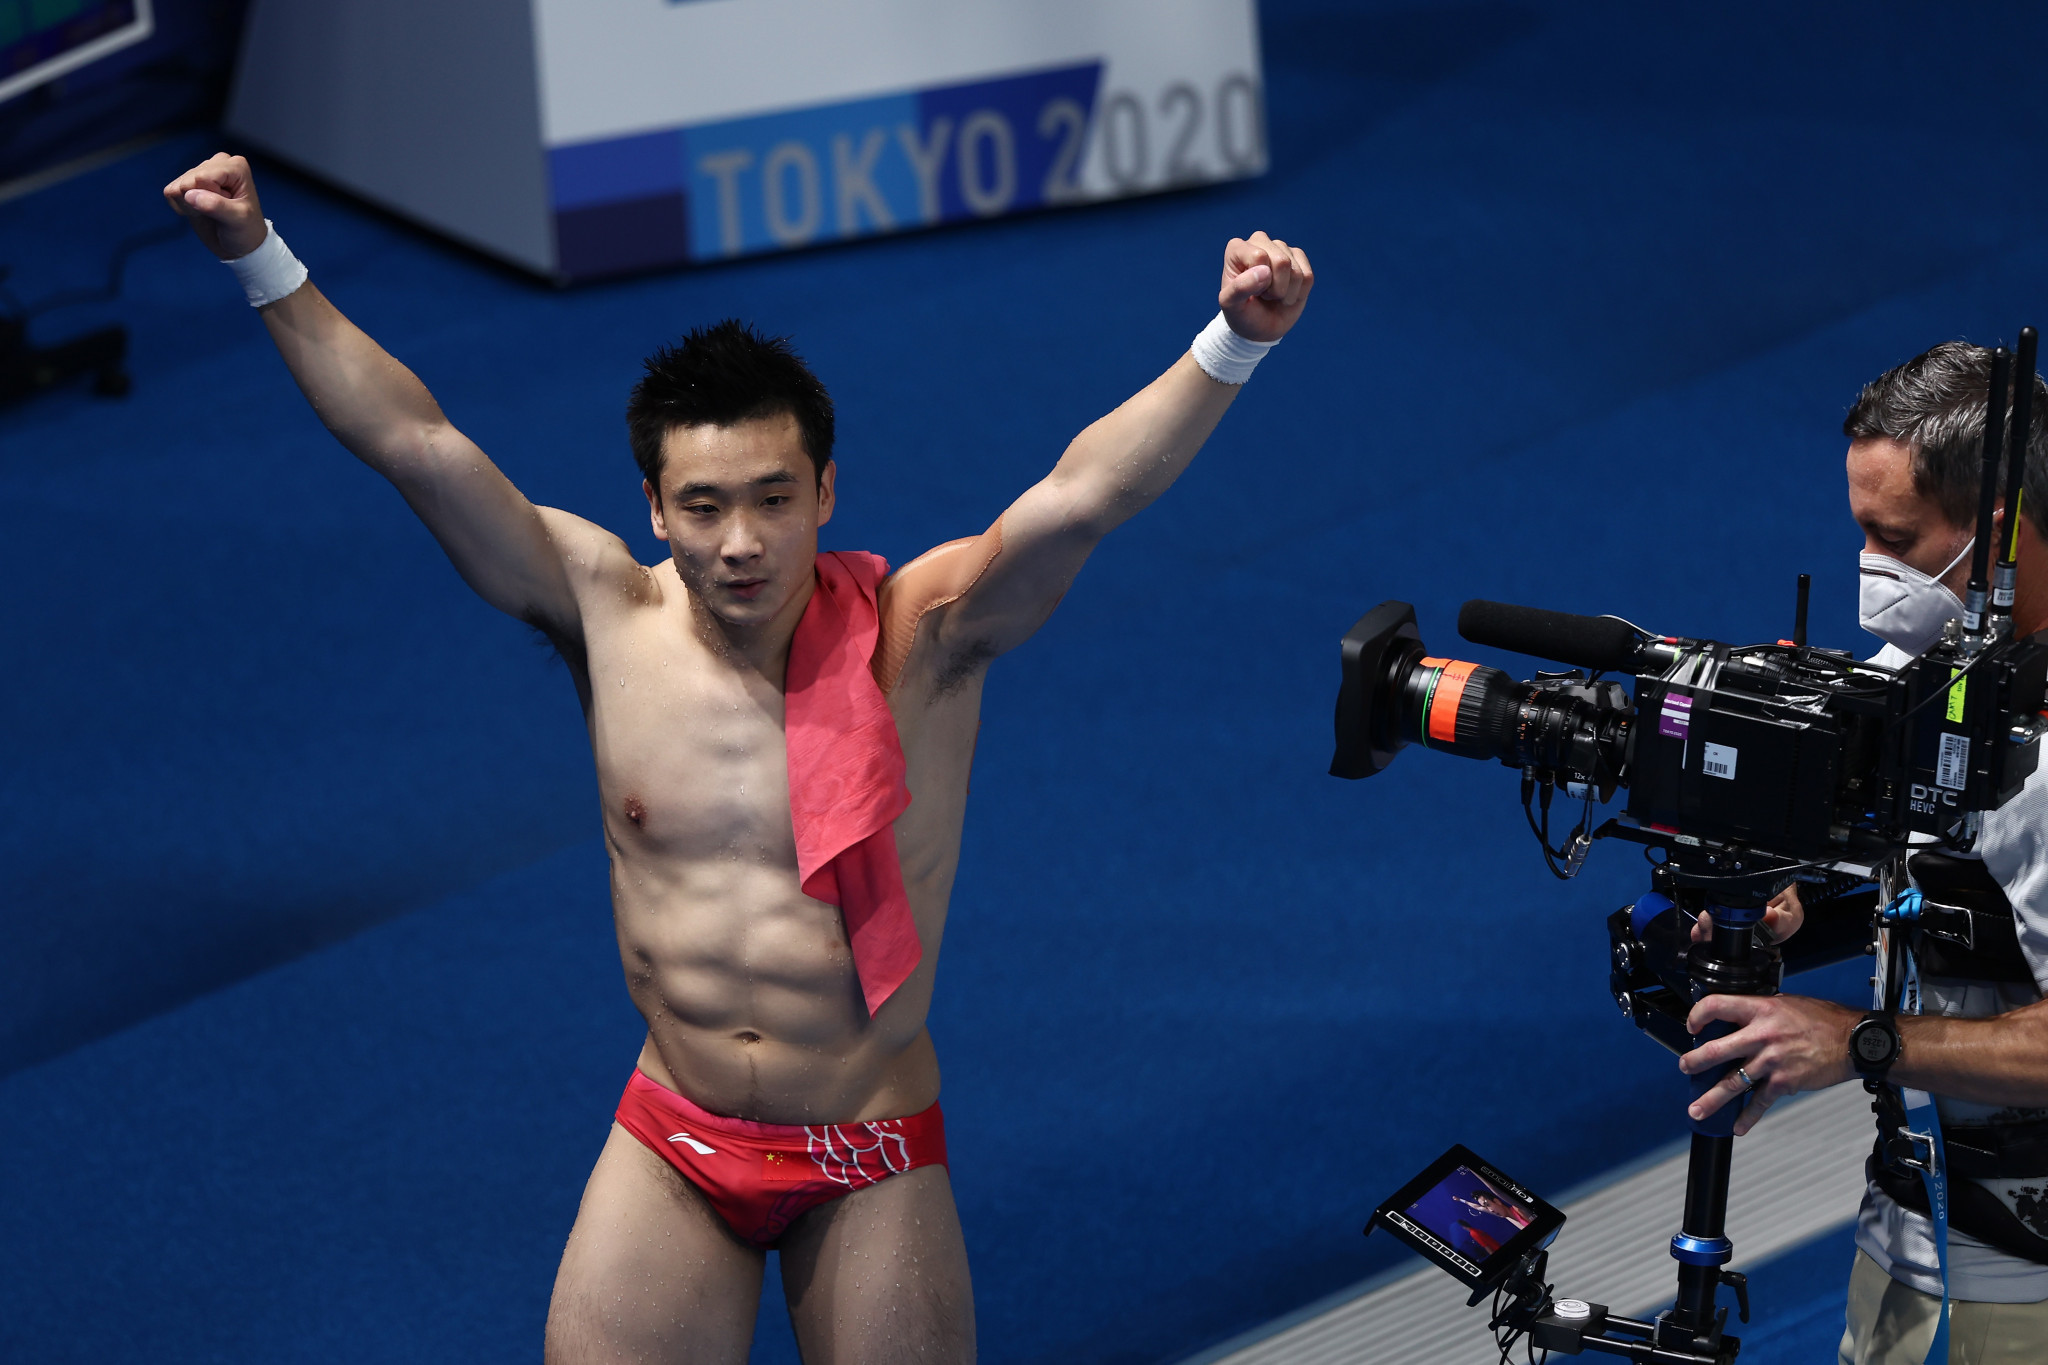 Cao Yuan bags 10m platform gold as China pull off near-perfect diving showing at Tokyo 2020